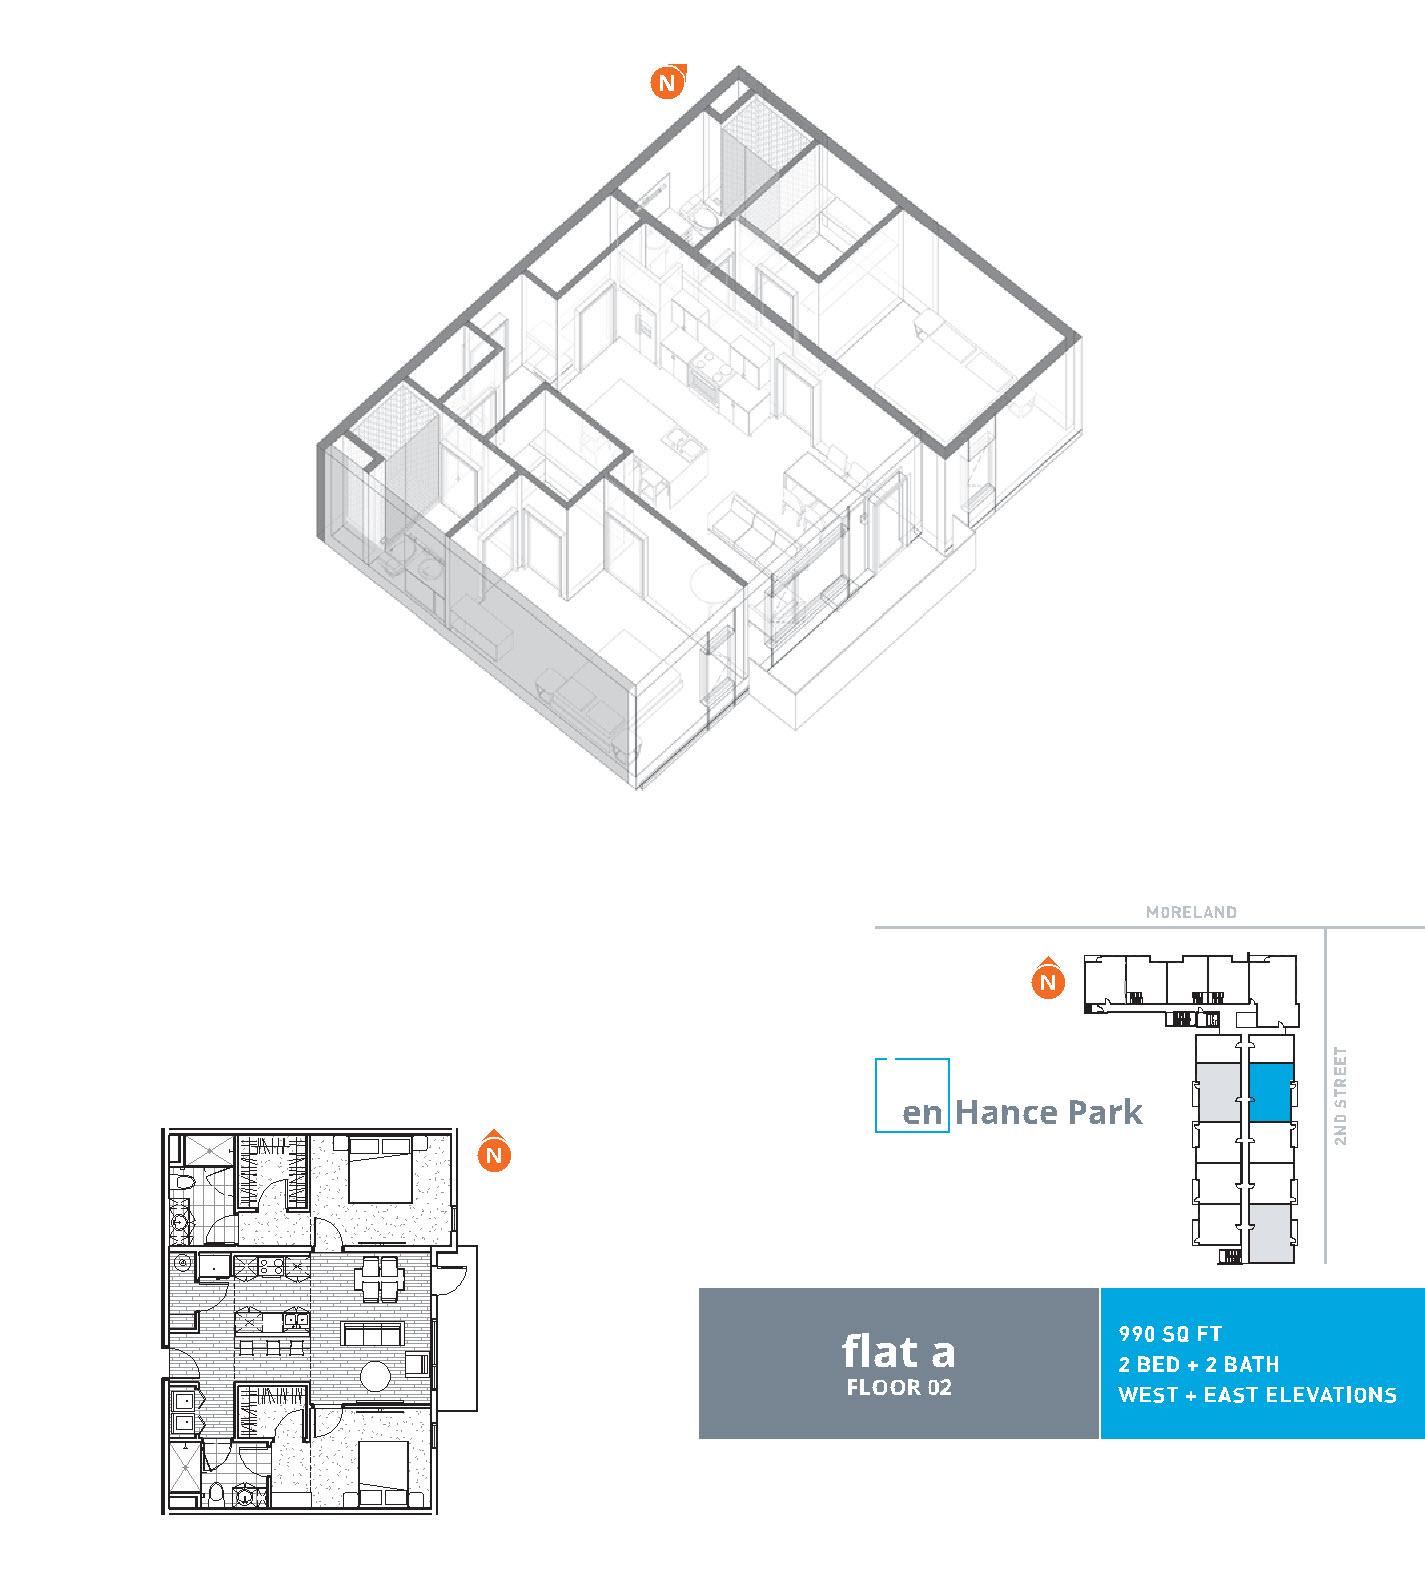 En hance park condo floor plan flat a 2bd